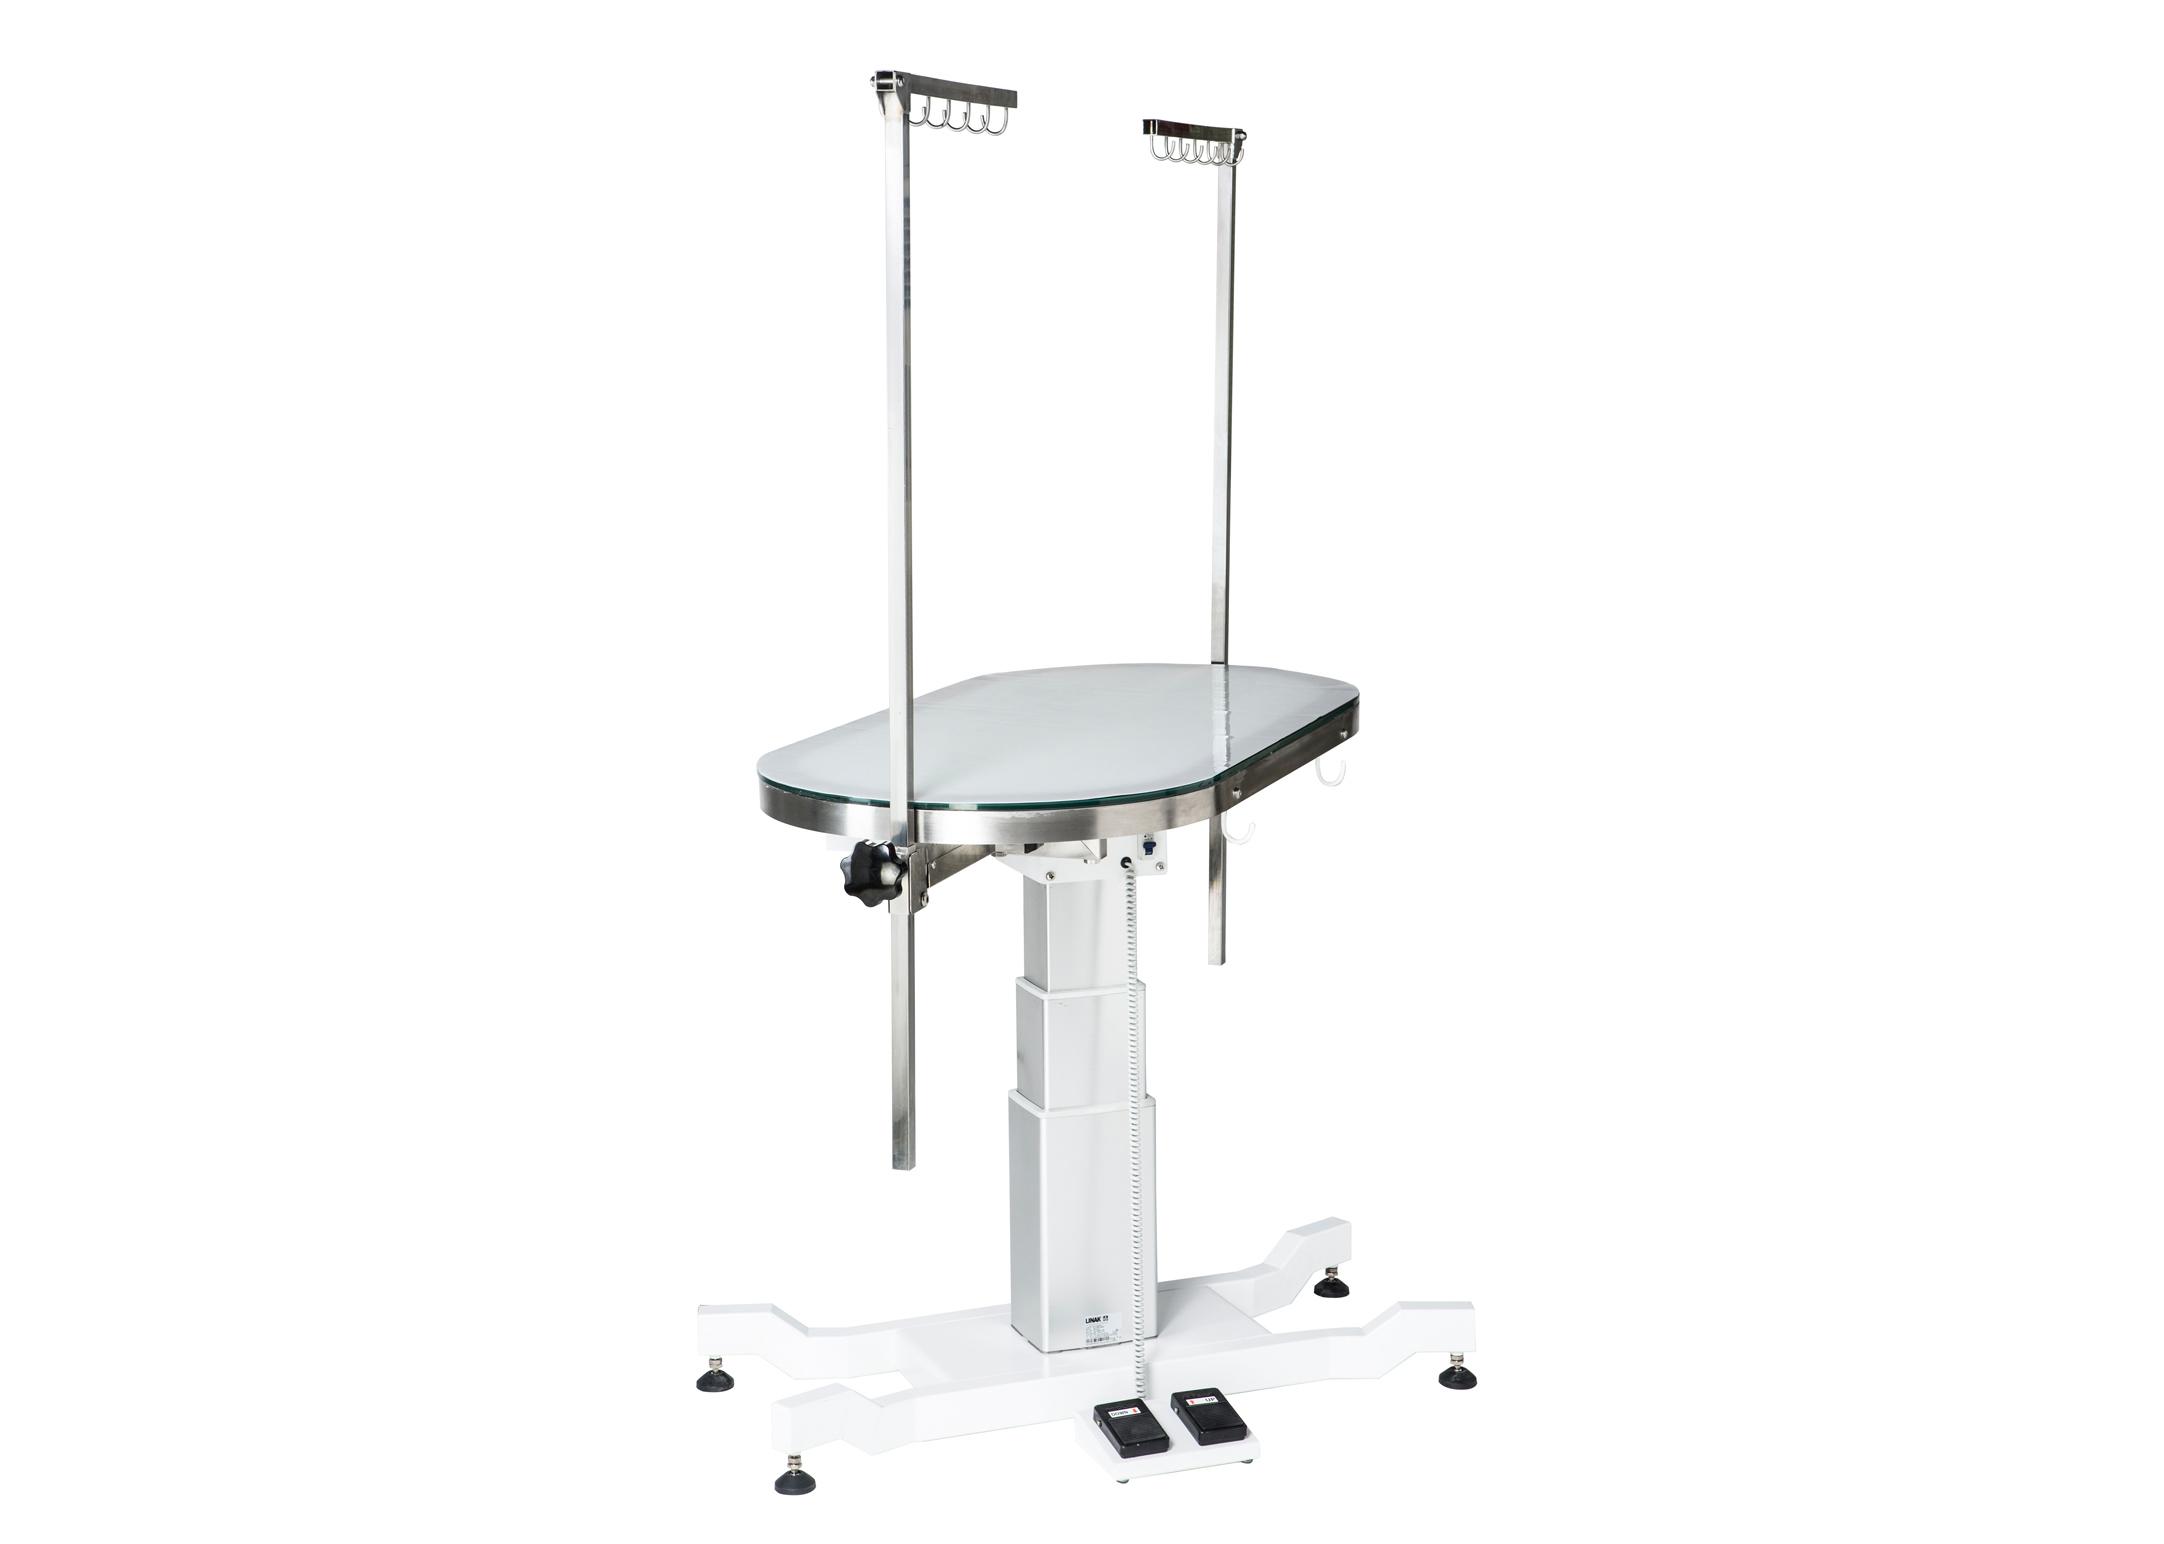 Groom-X Kitty's Turning Electric Grooming Table 120x60x61,5-102cmh